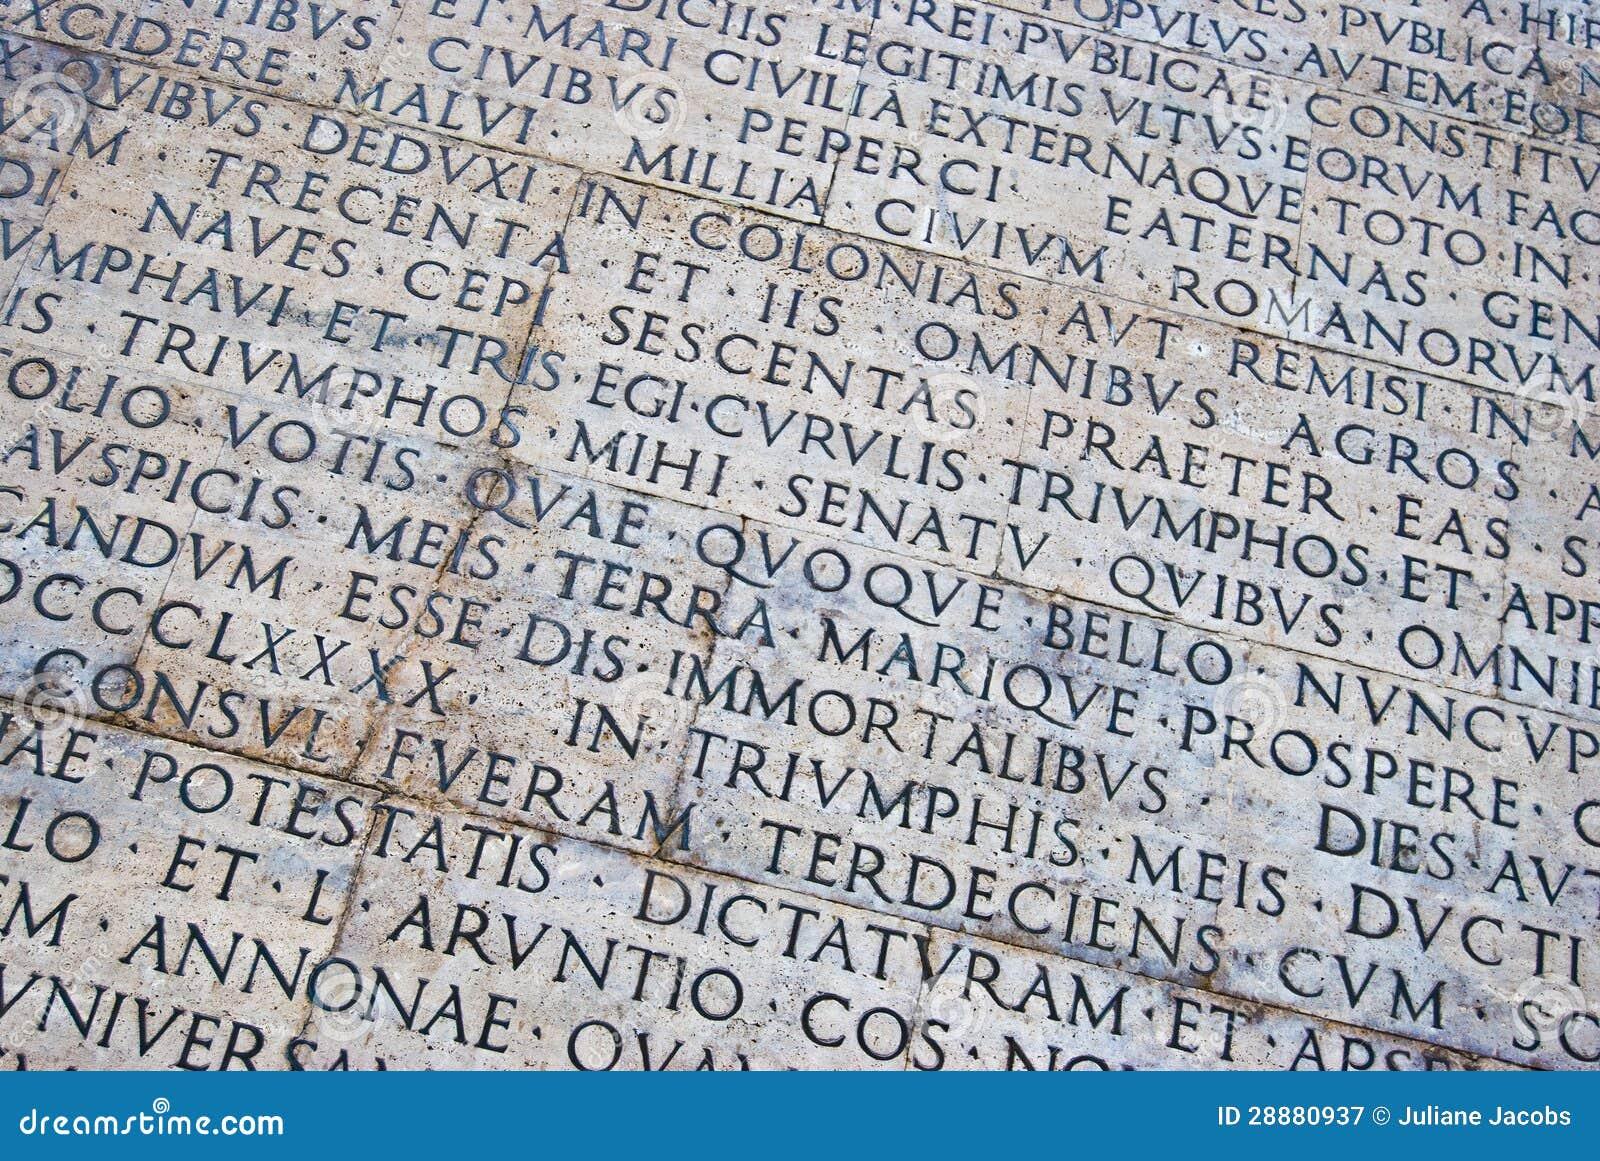 Roman scripture